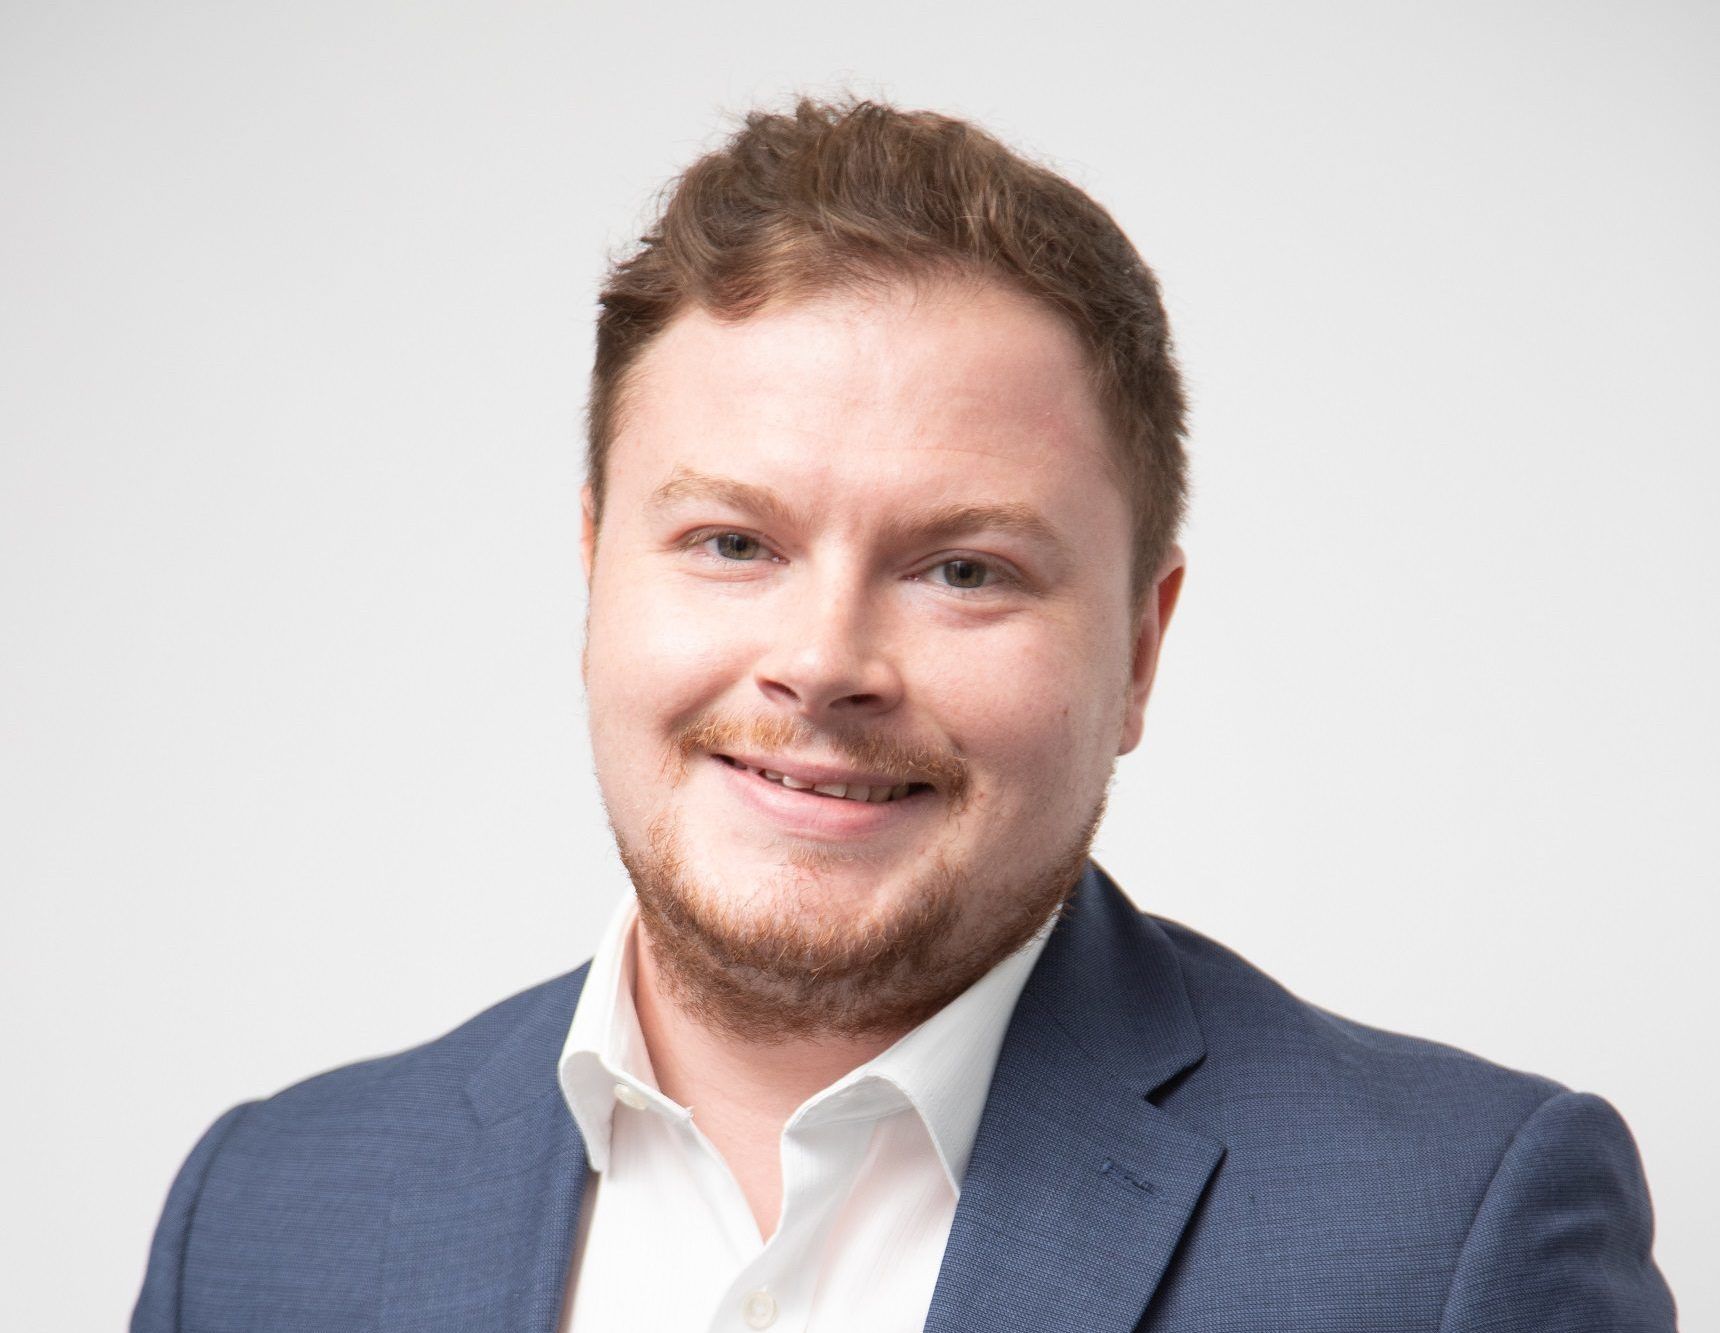 Tom Leaver, Partner & Commercial Director of Fullbrook Thorpe Investments LLP